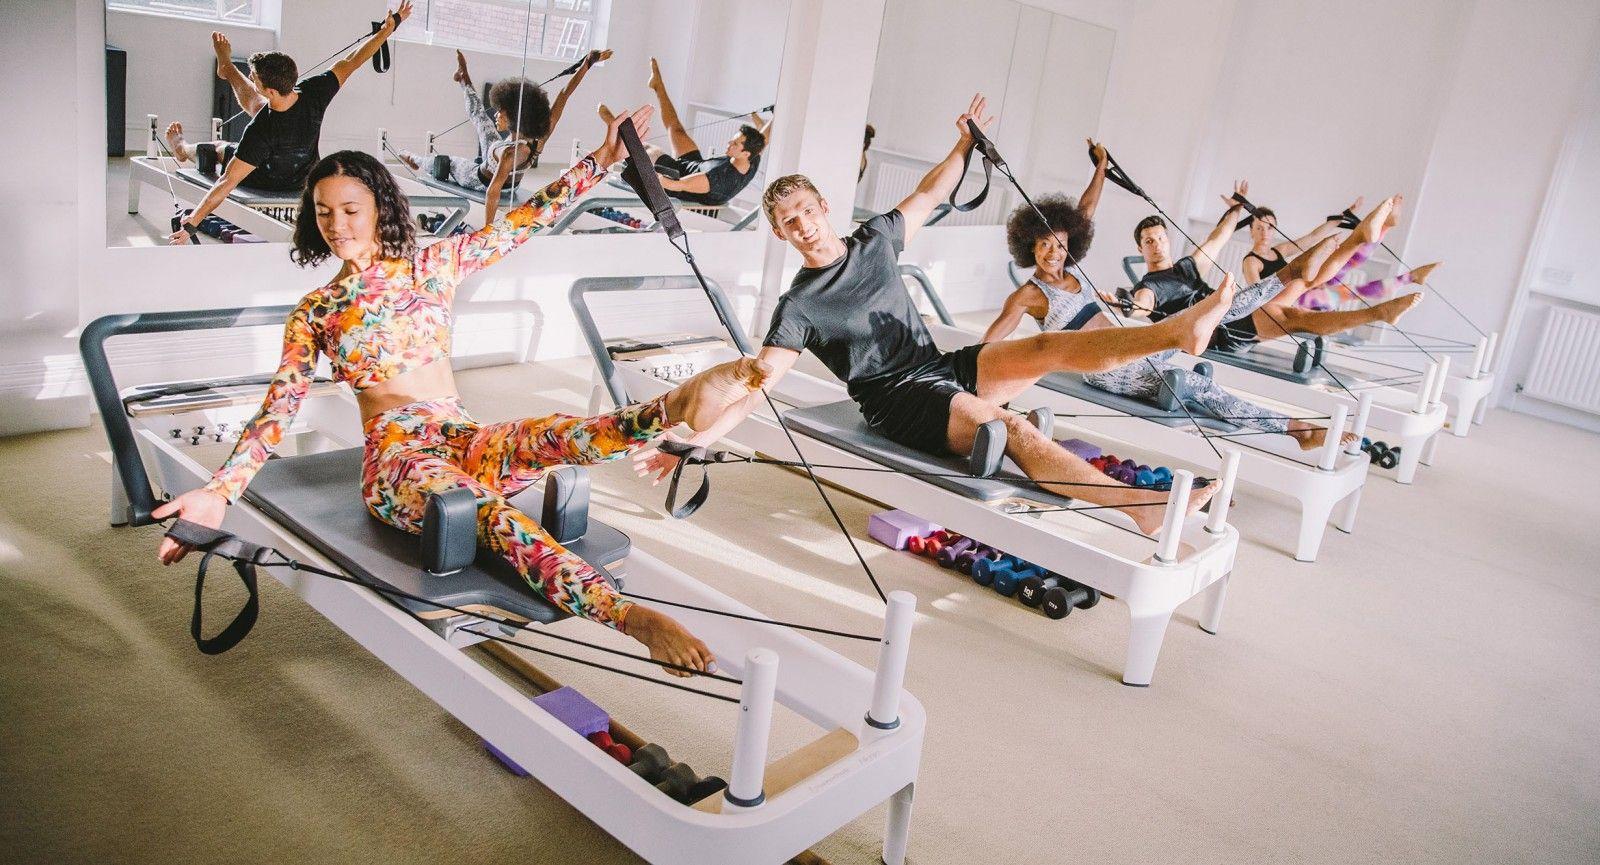 Home pilates london pilates workout pilates